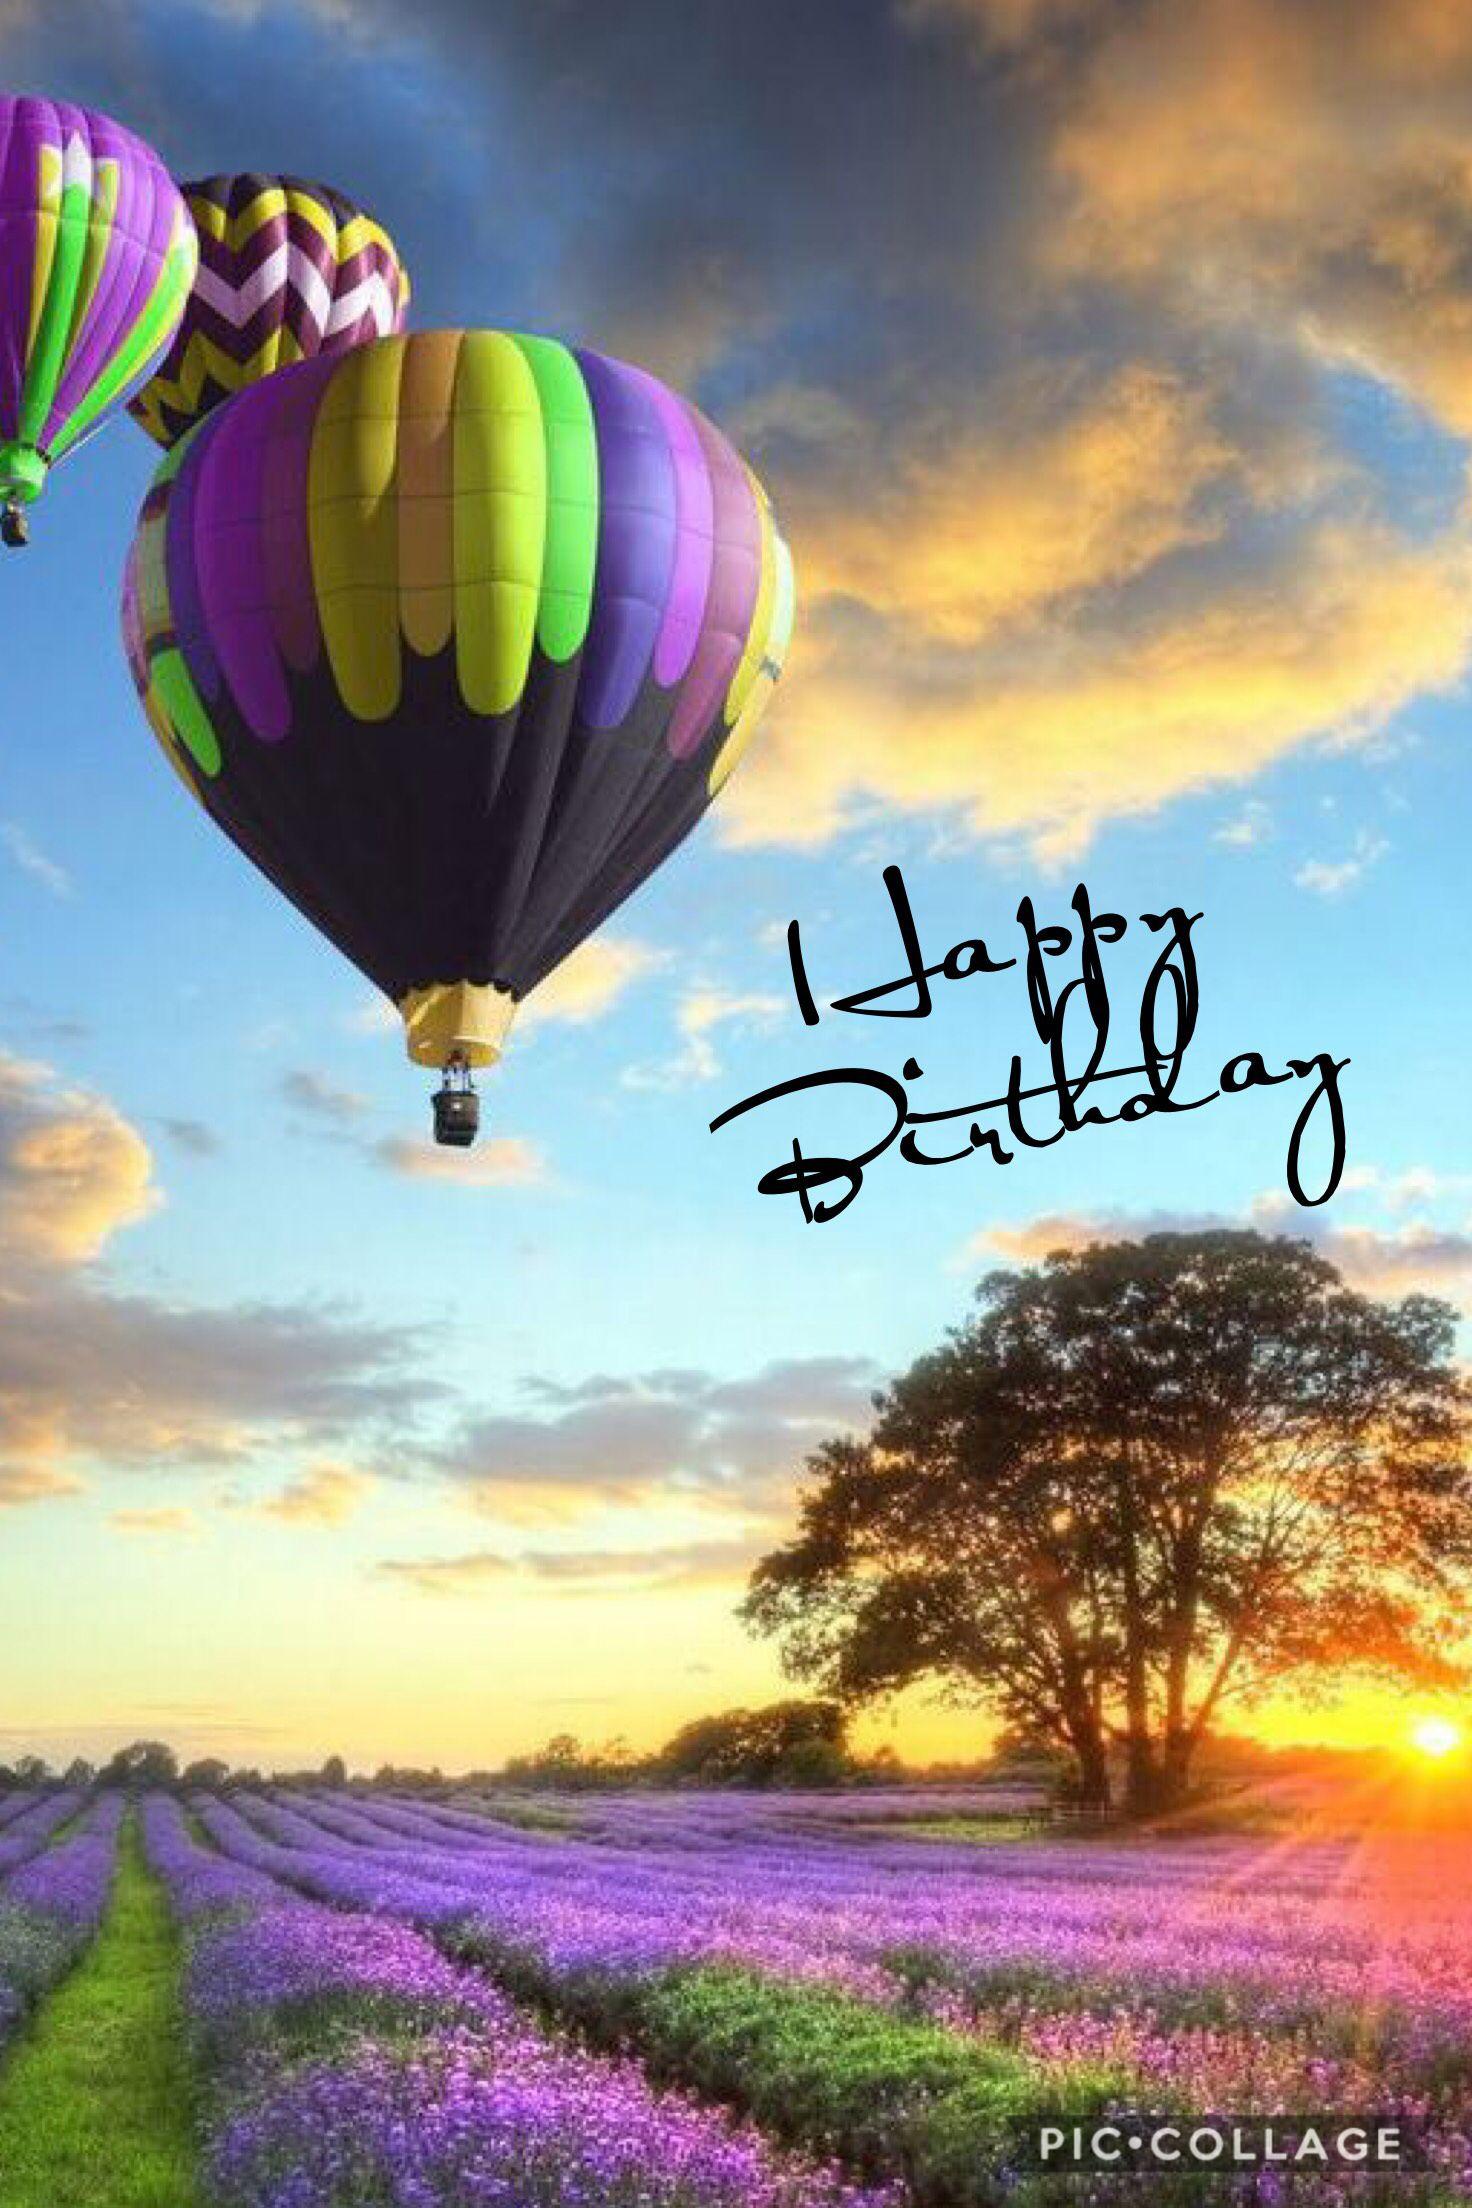 Happy Birthday Wishes Nature ~ Jani zo srdca el�m kr�sne narodeniny vela zdravia astia l�sky a splnenie v etk�ch prian�